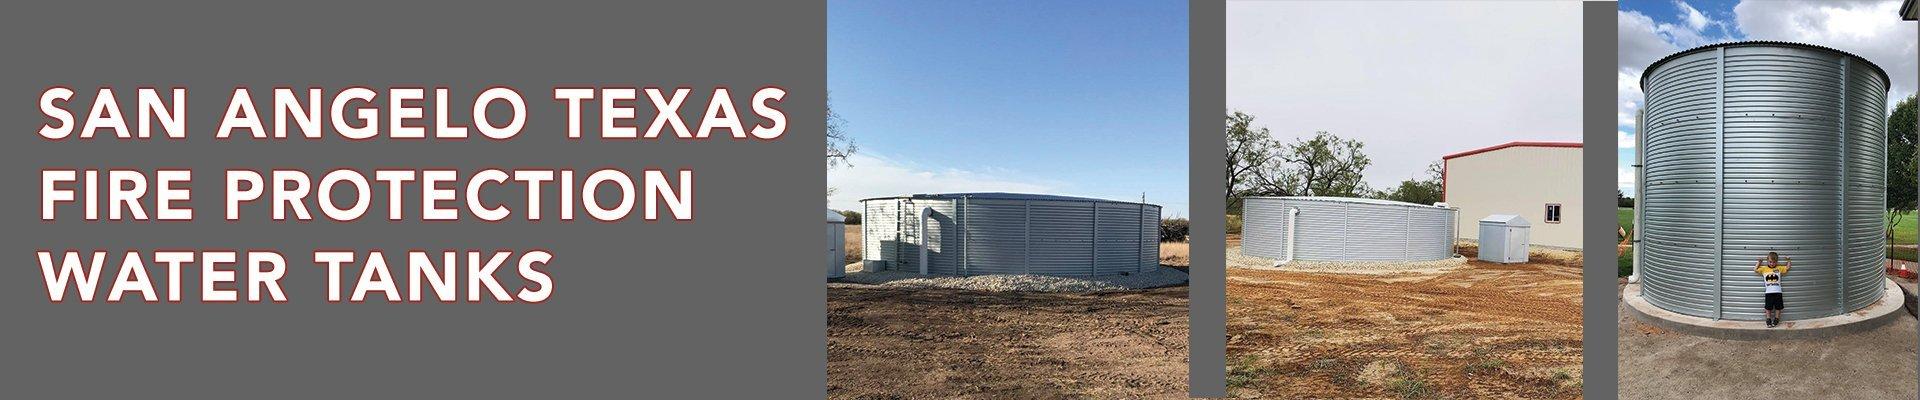 San Angelo Texas fire protection water tanks